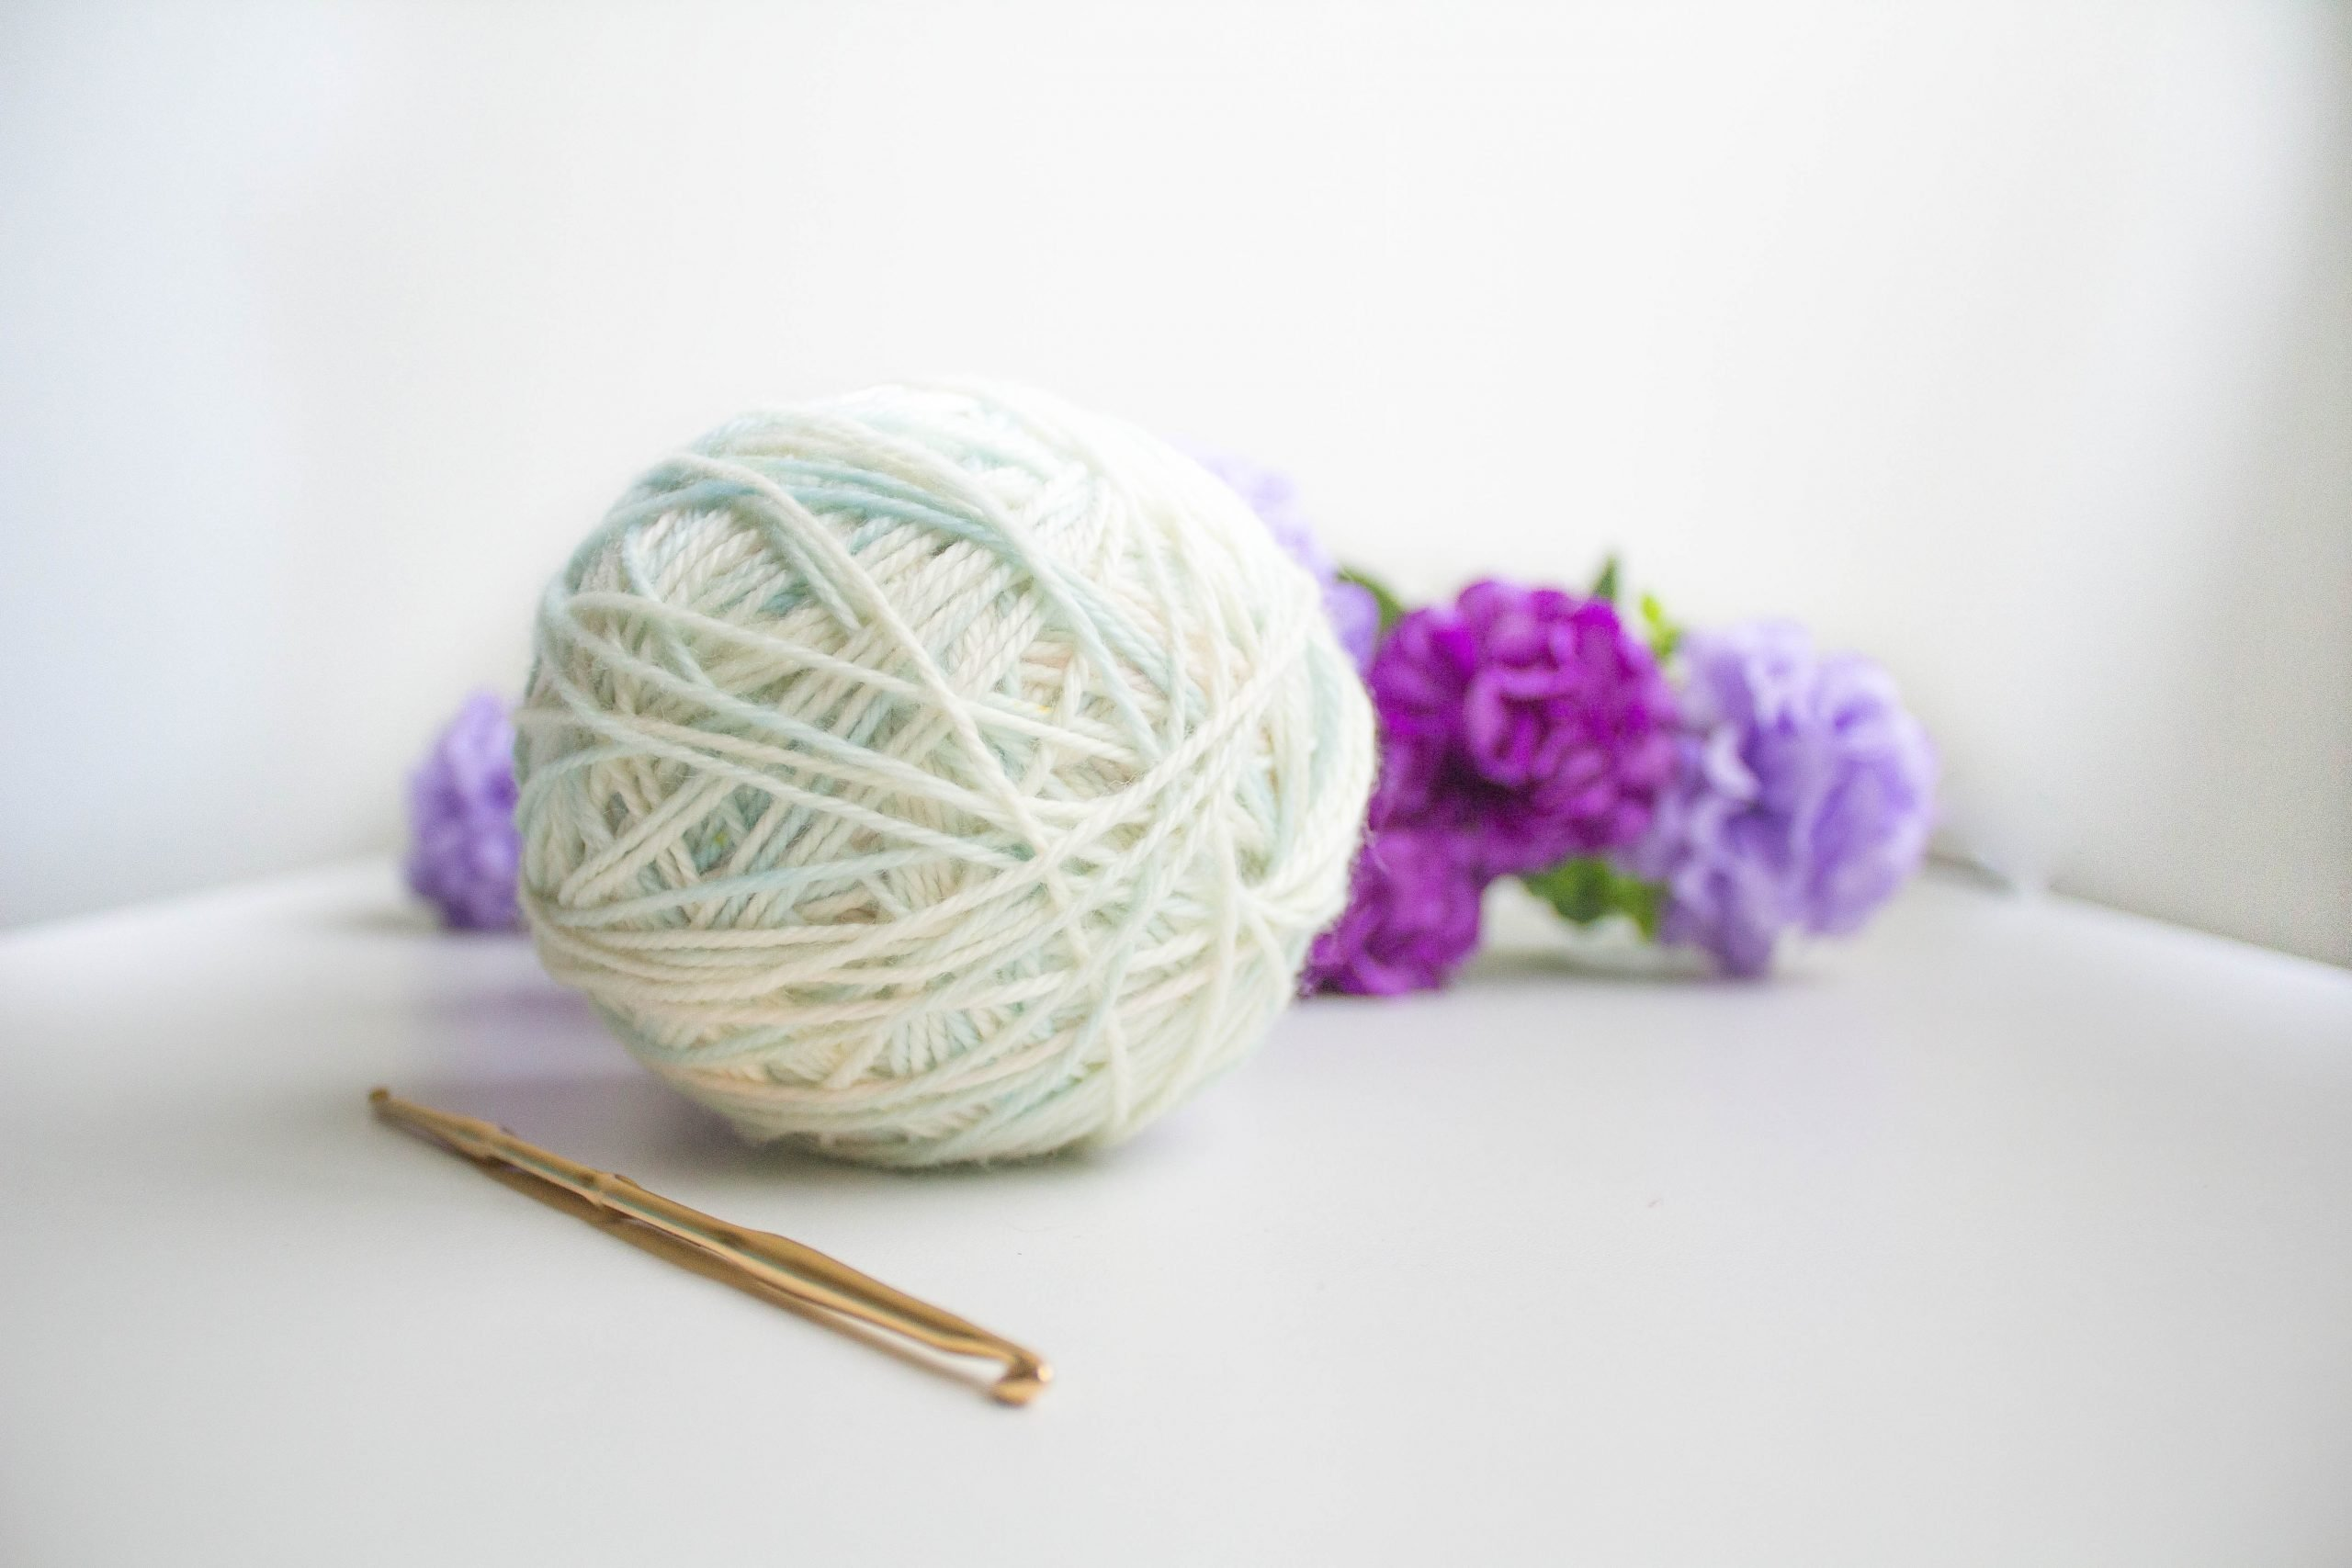 Crochet Tools Every Beginner Needs